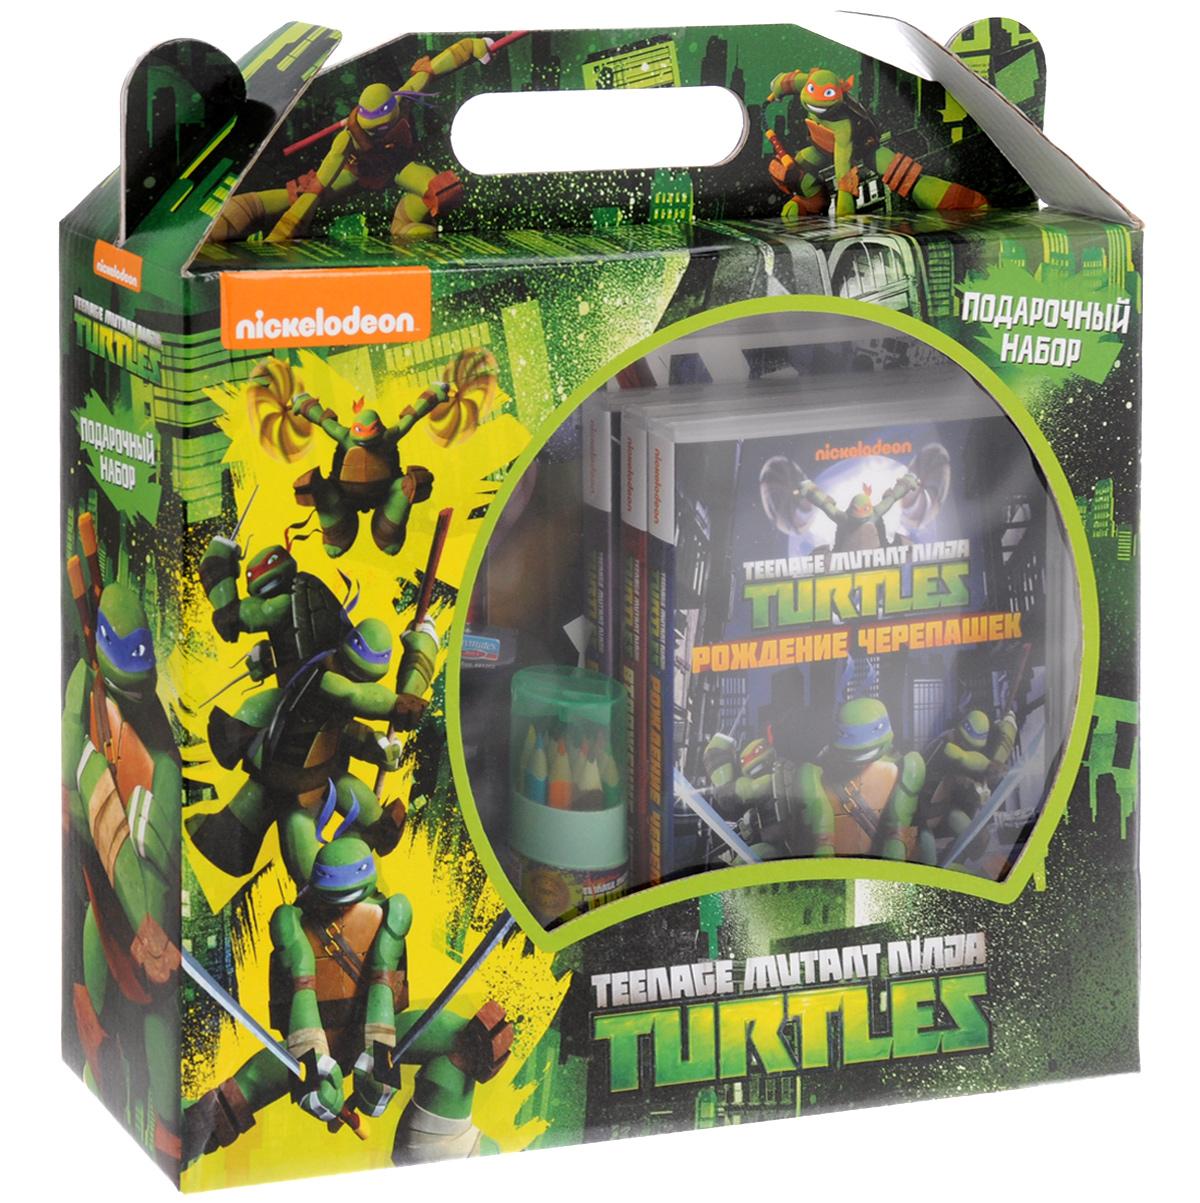 Teenage Mutant Ninja Turtles: Подарочный набор (3 DVD + сувениры) 2015 comics teenage mutant ninja turtles wallet dollar price purse pu tide men women boys girls wallets for young students w020